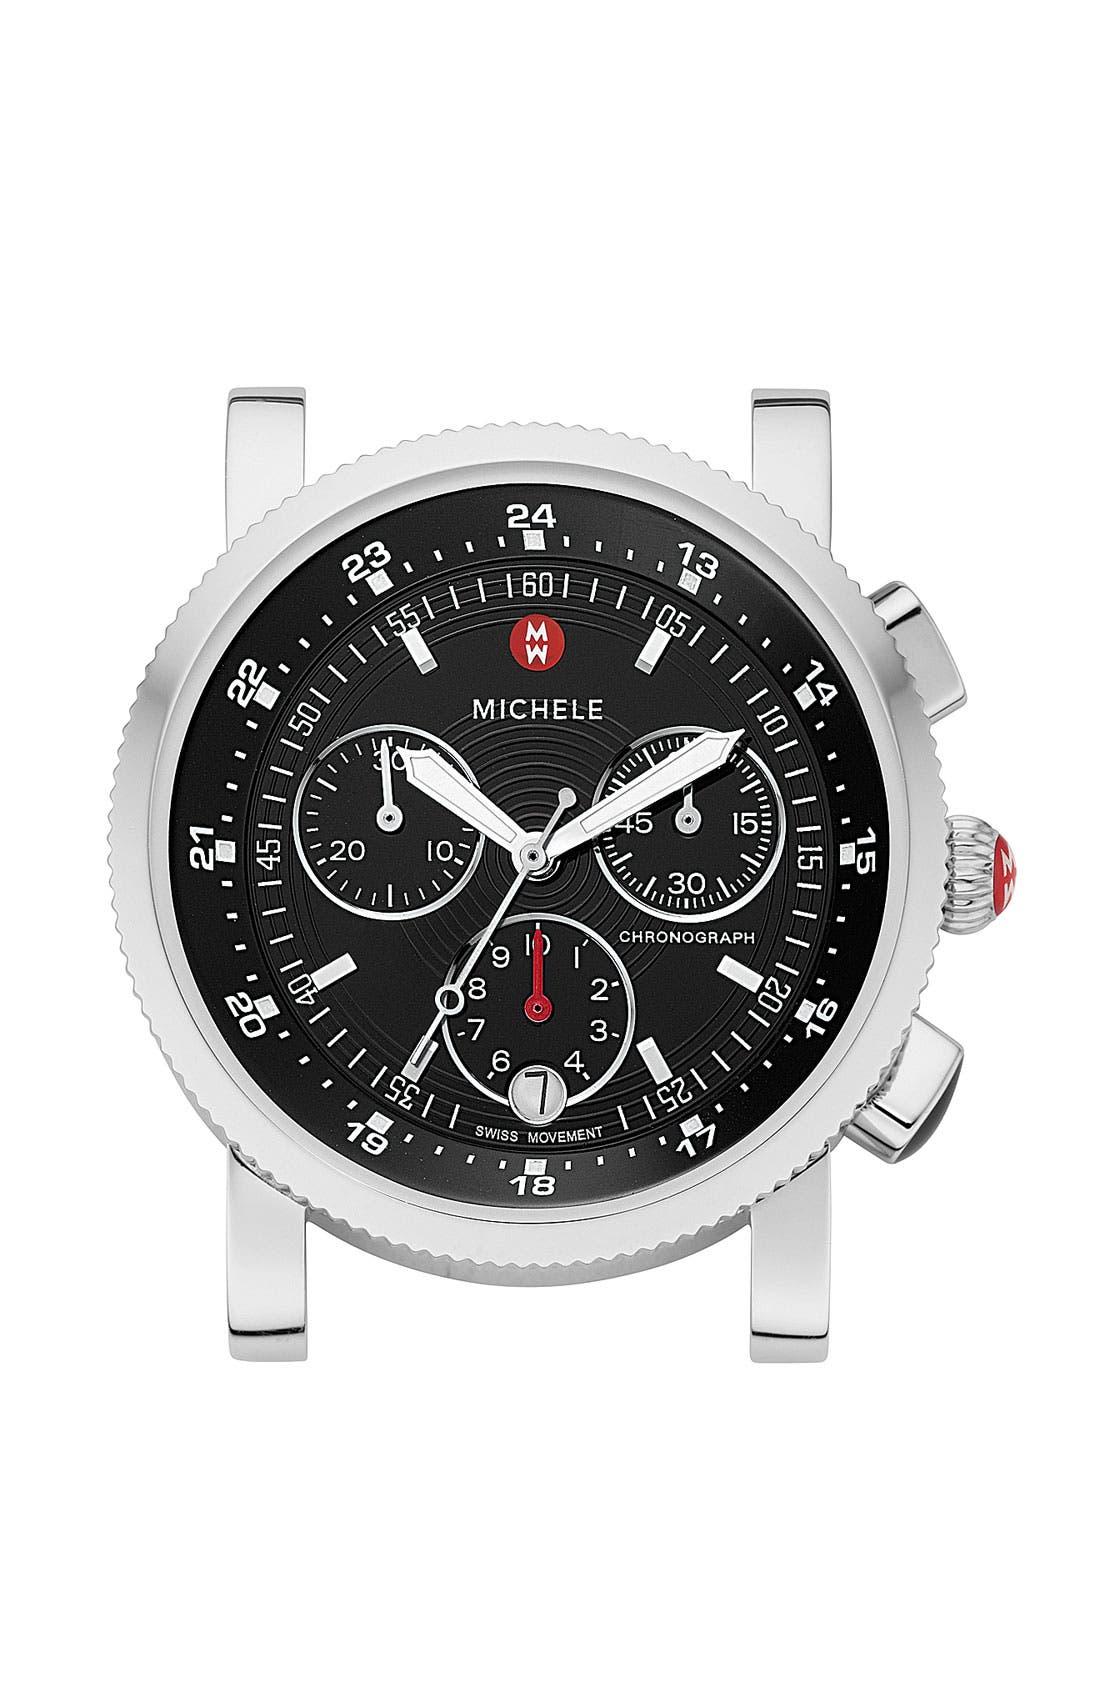 Main Image - MICHELE 'Sport Sail' Black Dial Watch Case, 38mm